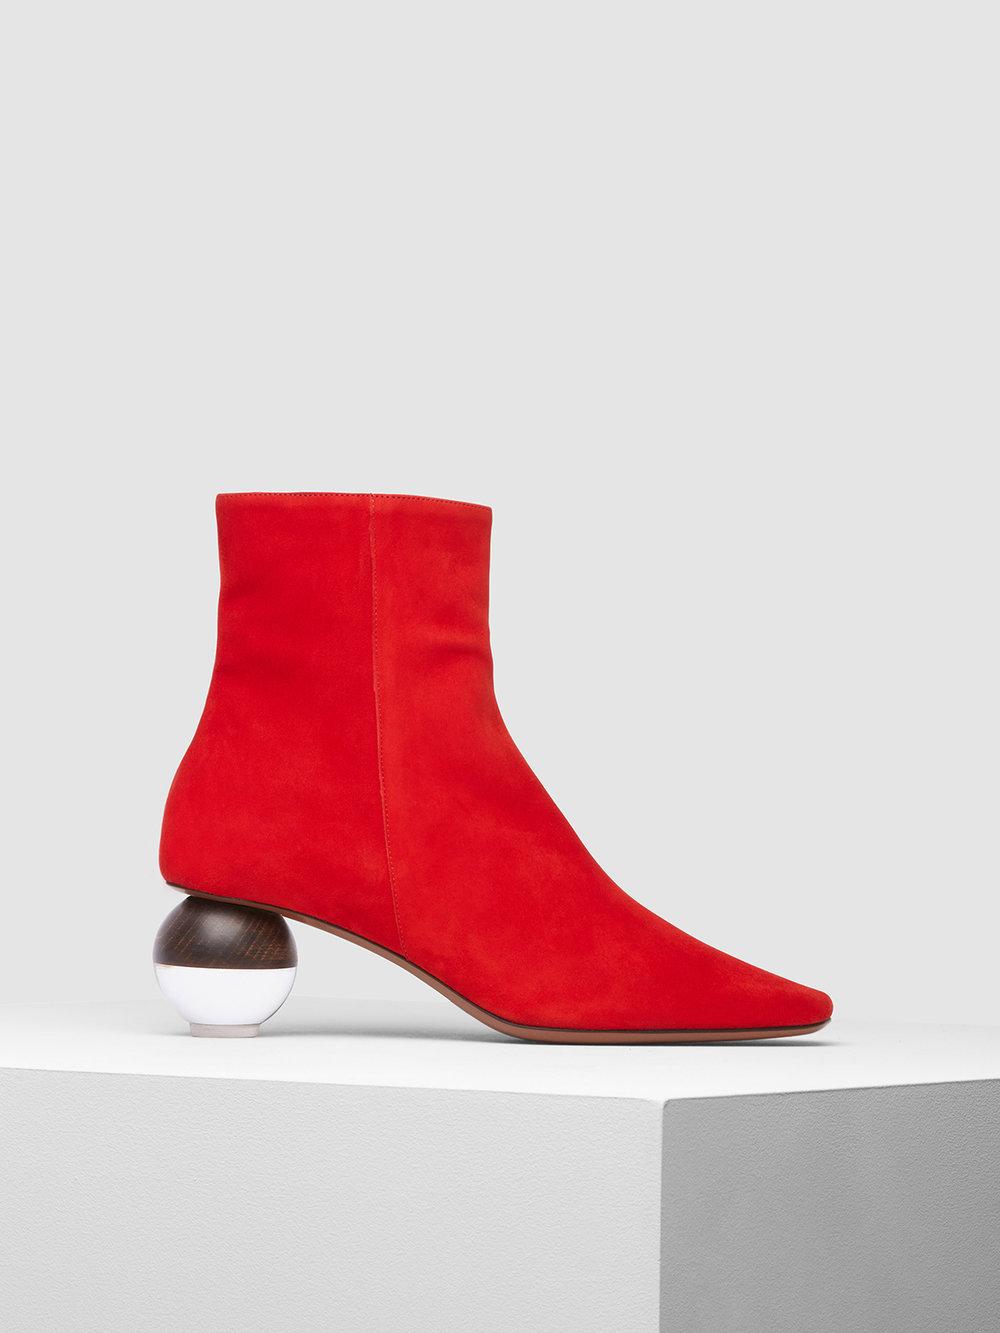 Encyclia boot red side.jpg